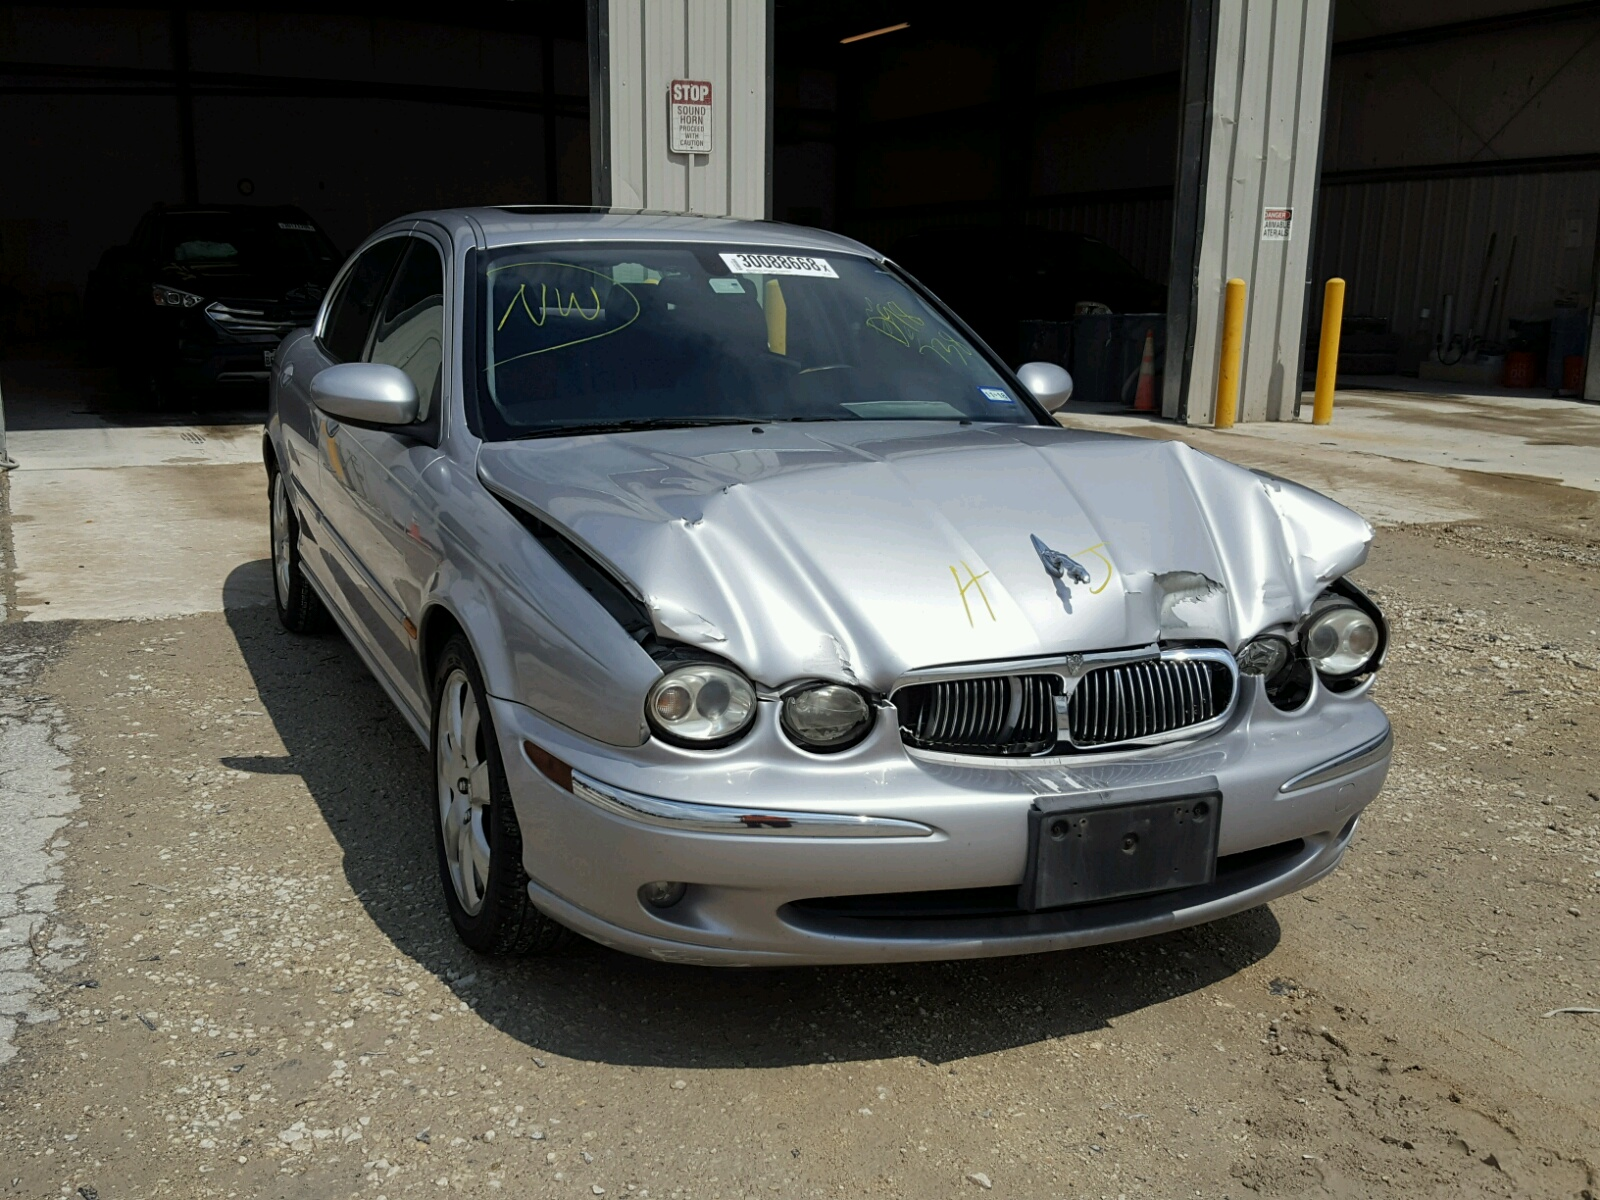 jaguar com for std type c cc x sale of listings large in mississippi lrnw classiccars biloxi view picture